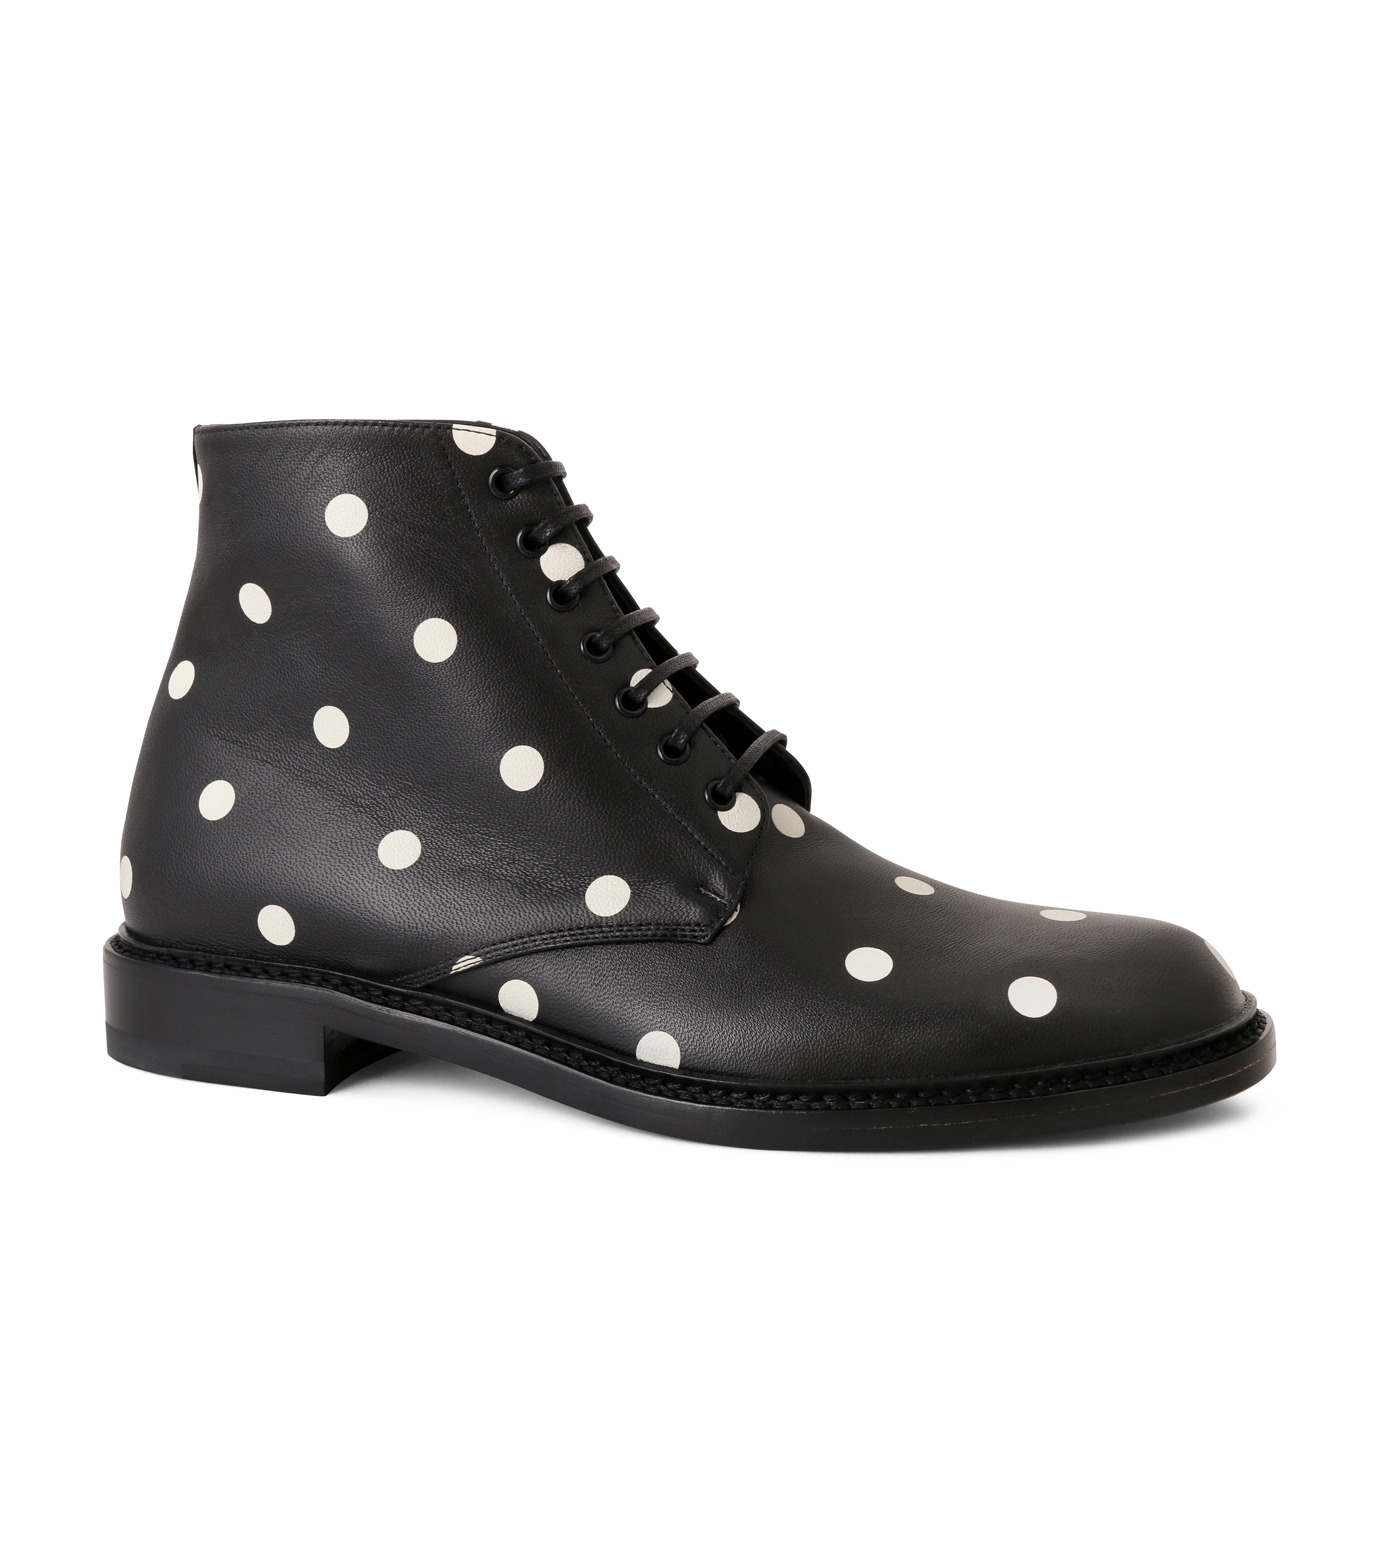 SAINT LAURENT(サンローラン)のLolita Lace Up Boots Dots-BLACK(ブーツ/boots)-417667-CZC00-13 拡大詳細画像1